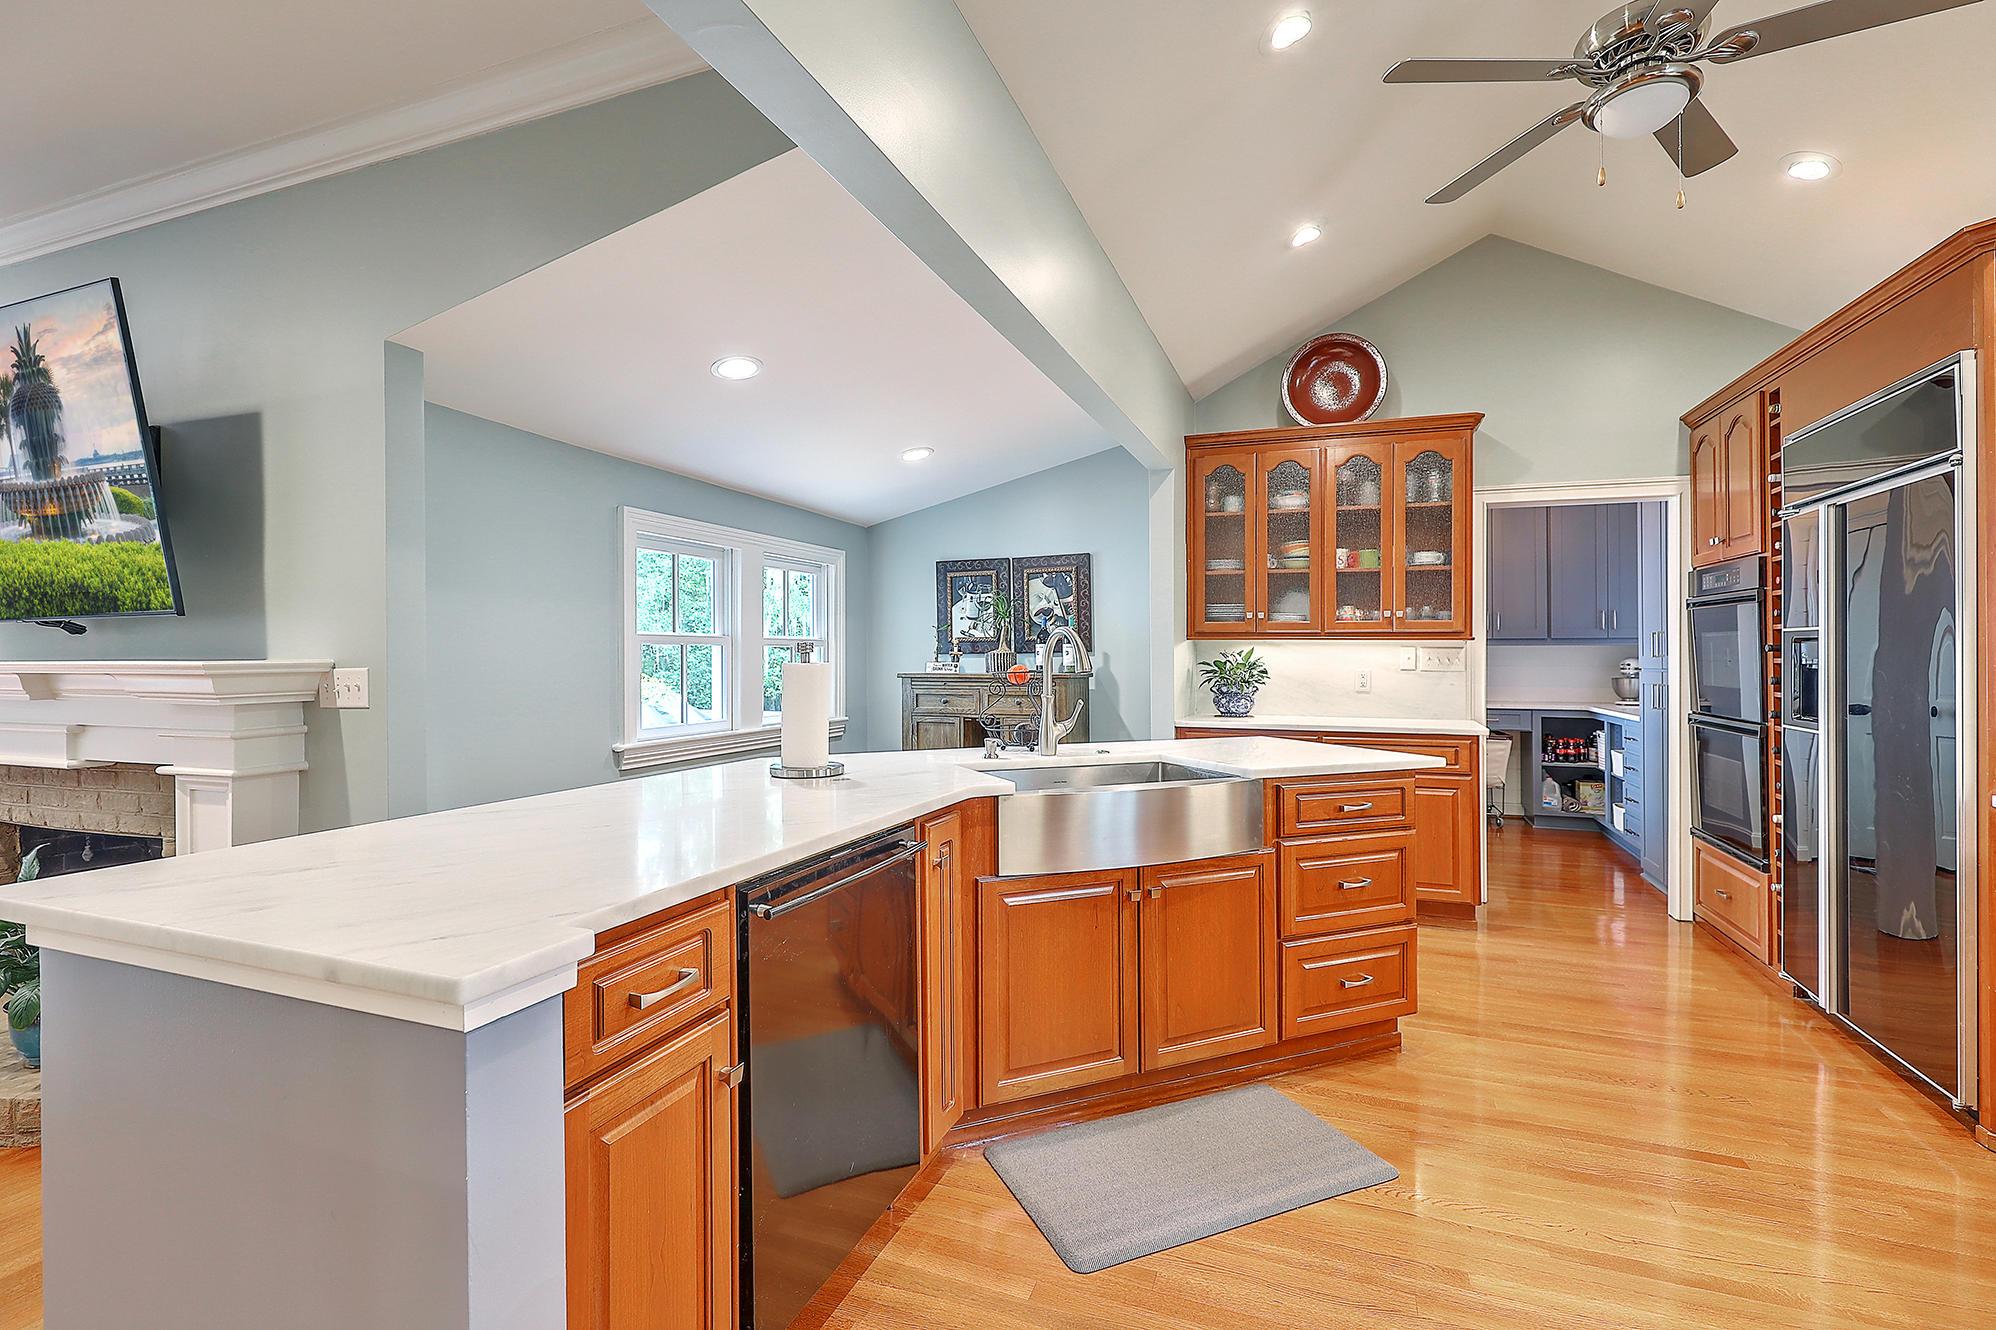 Summerville Homes For Sale - 102 Hickory, Summerville, SC - 50